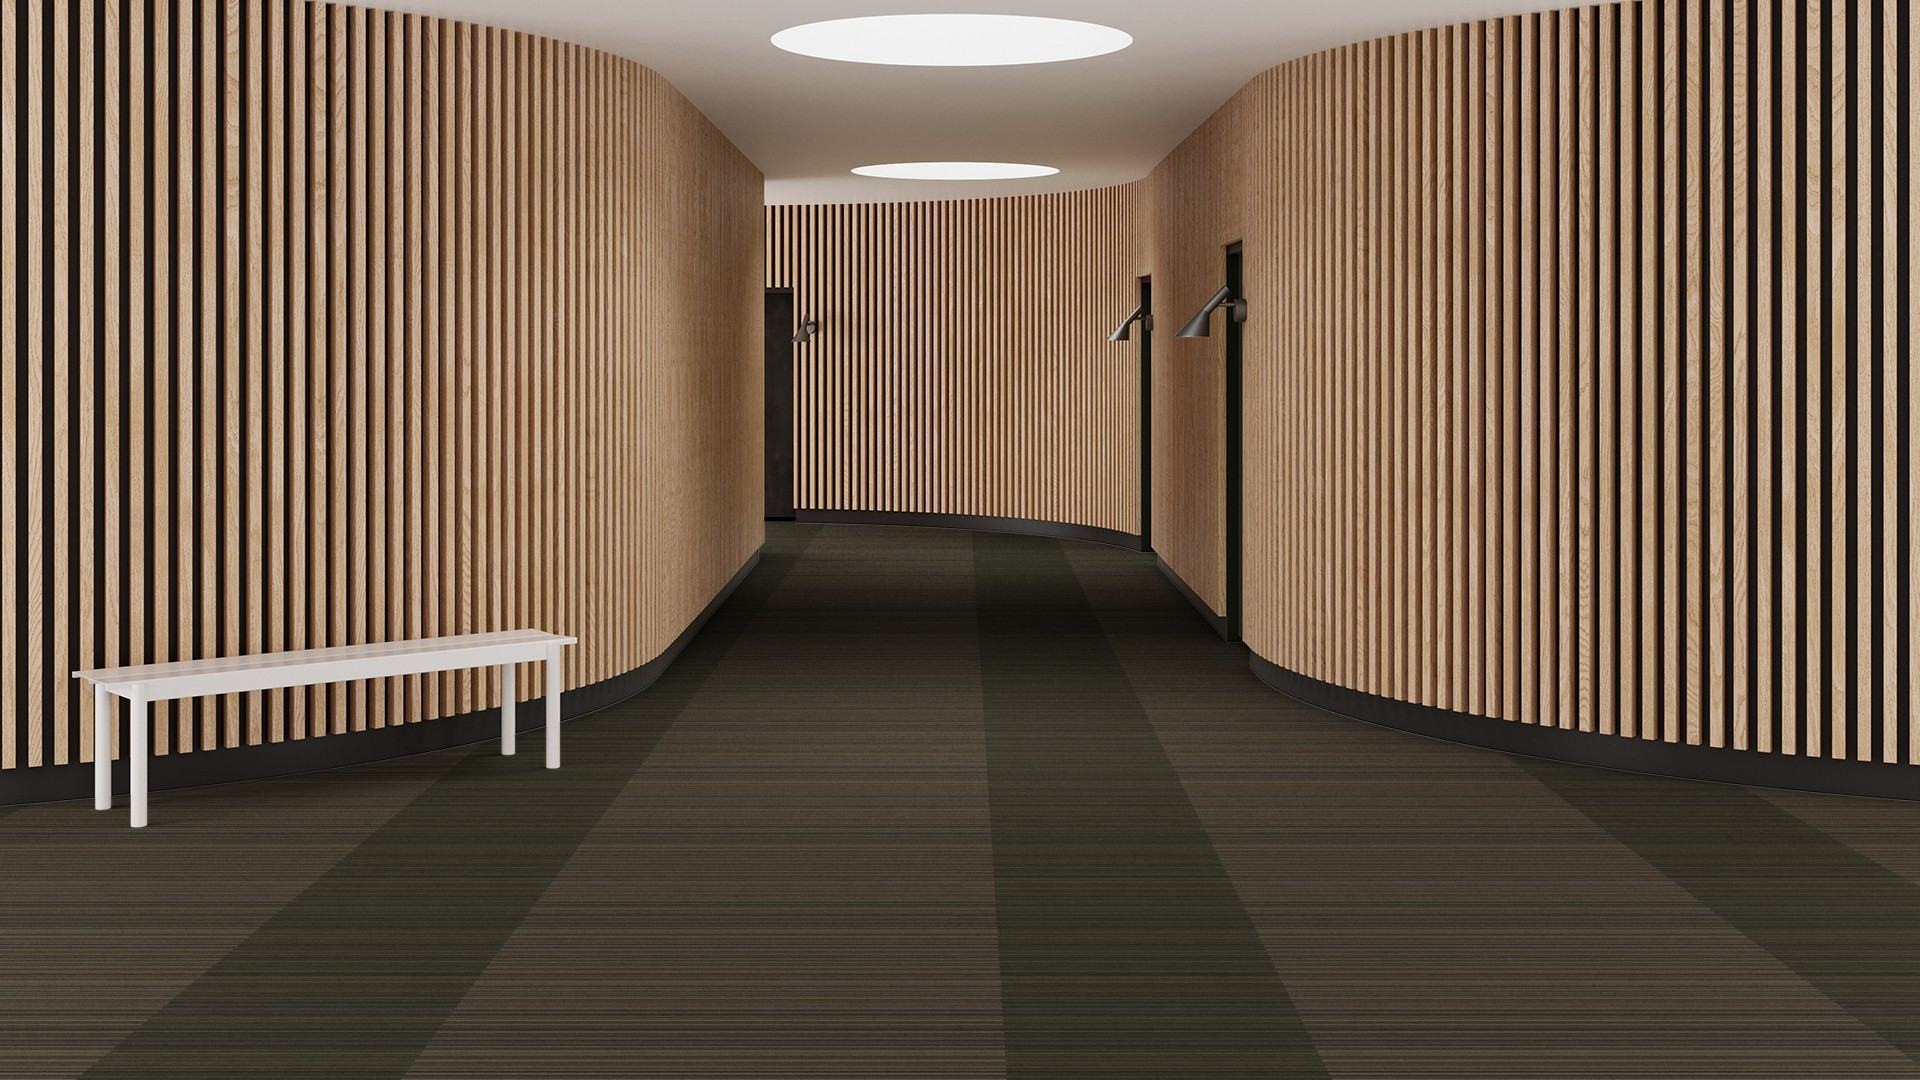 madras stripe corridor 195 cm green RoowView 3